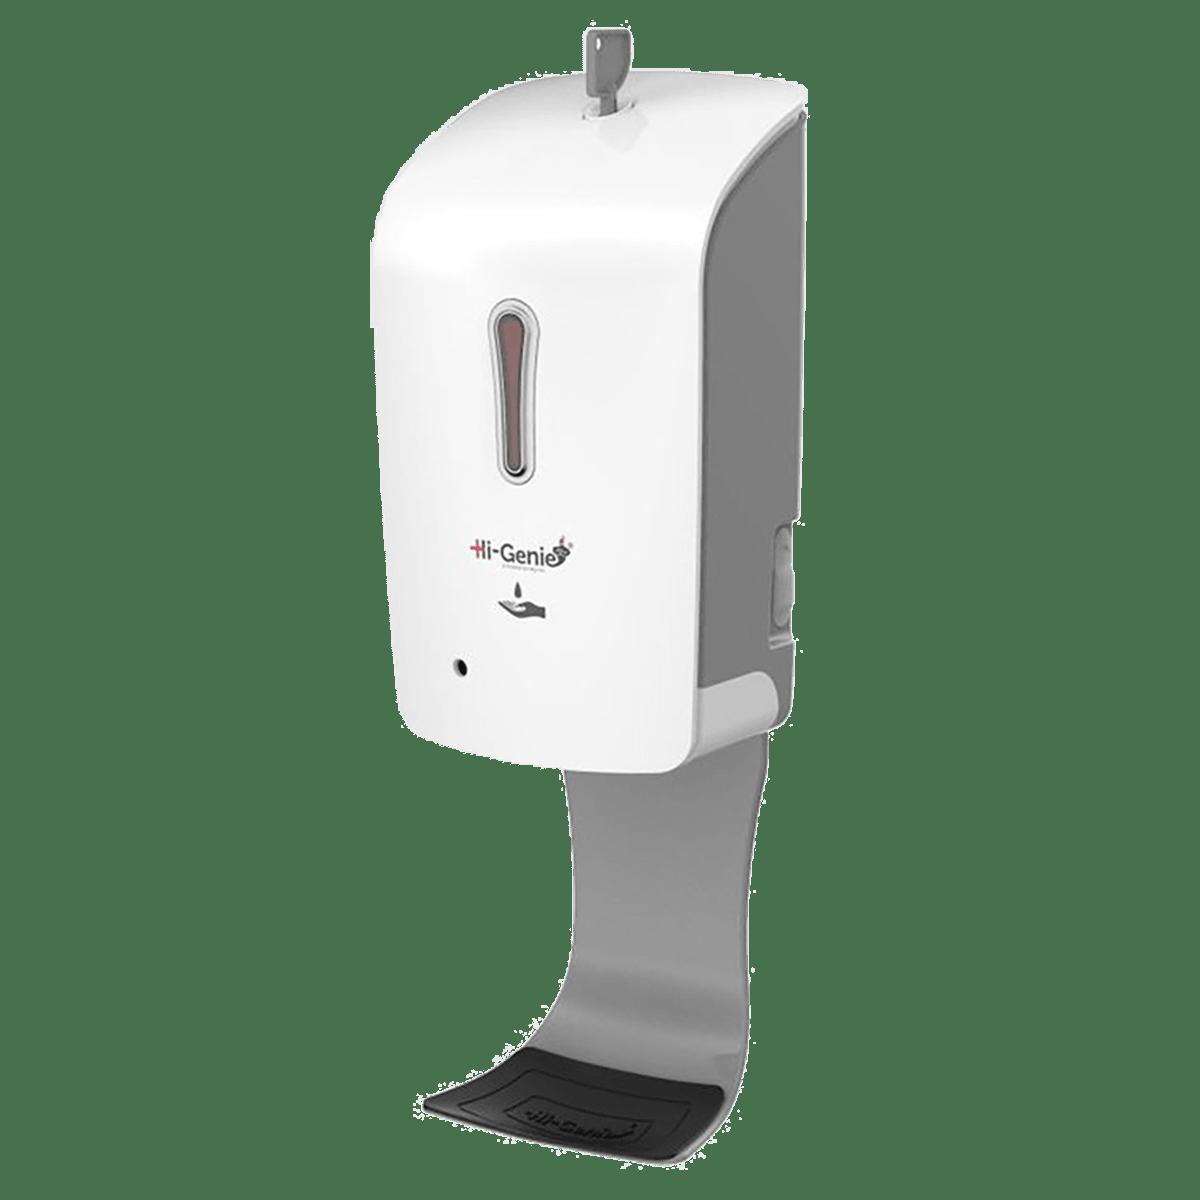 Hi-Genie Bulge Battery Powered Automatic Sanitizer Dispenser (Automatic Infrared Sensor, HG-003, White/Grey)